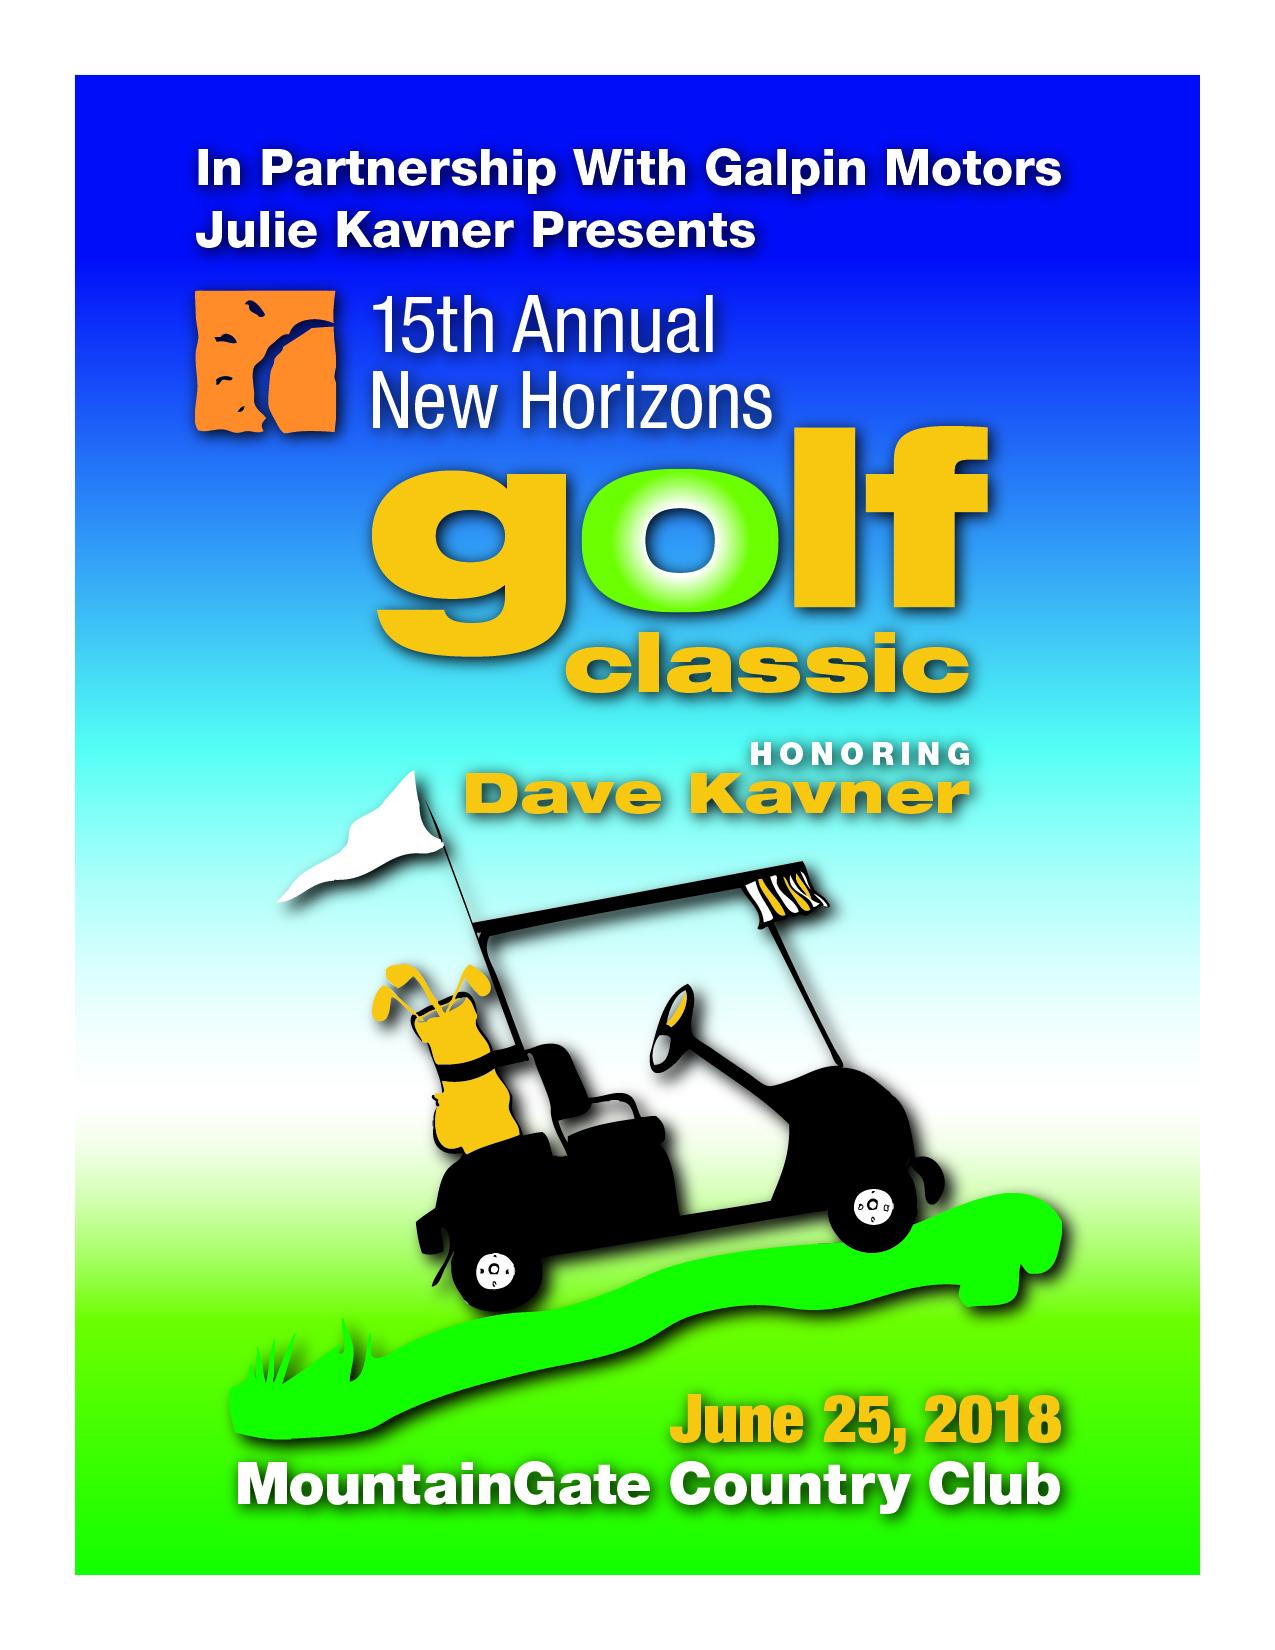 2018 golf classic logo final